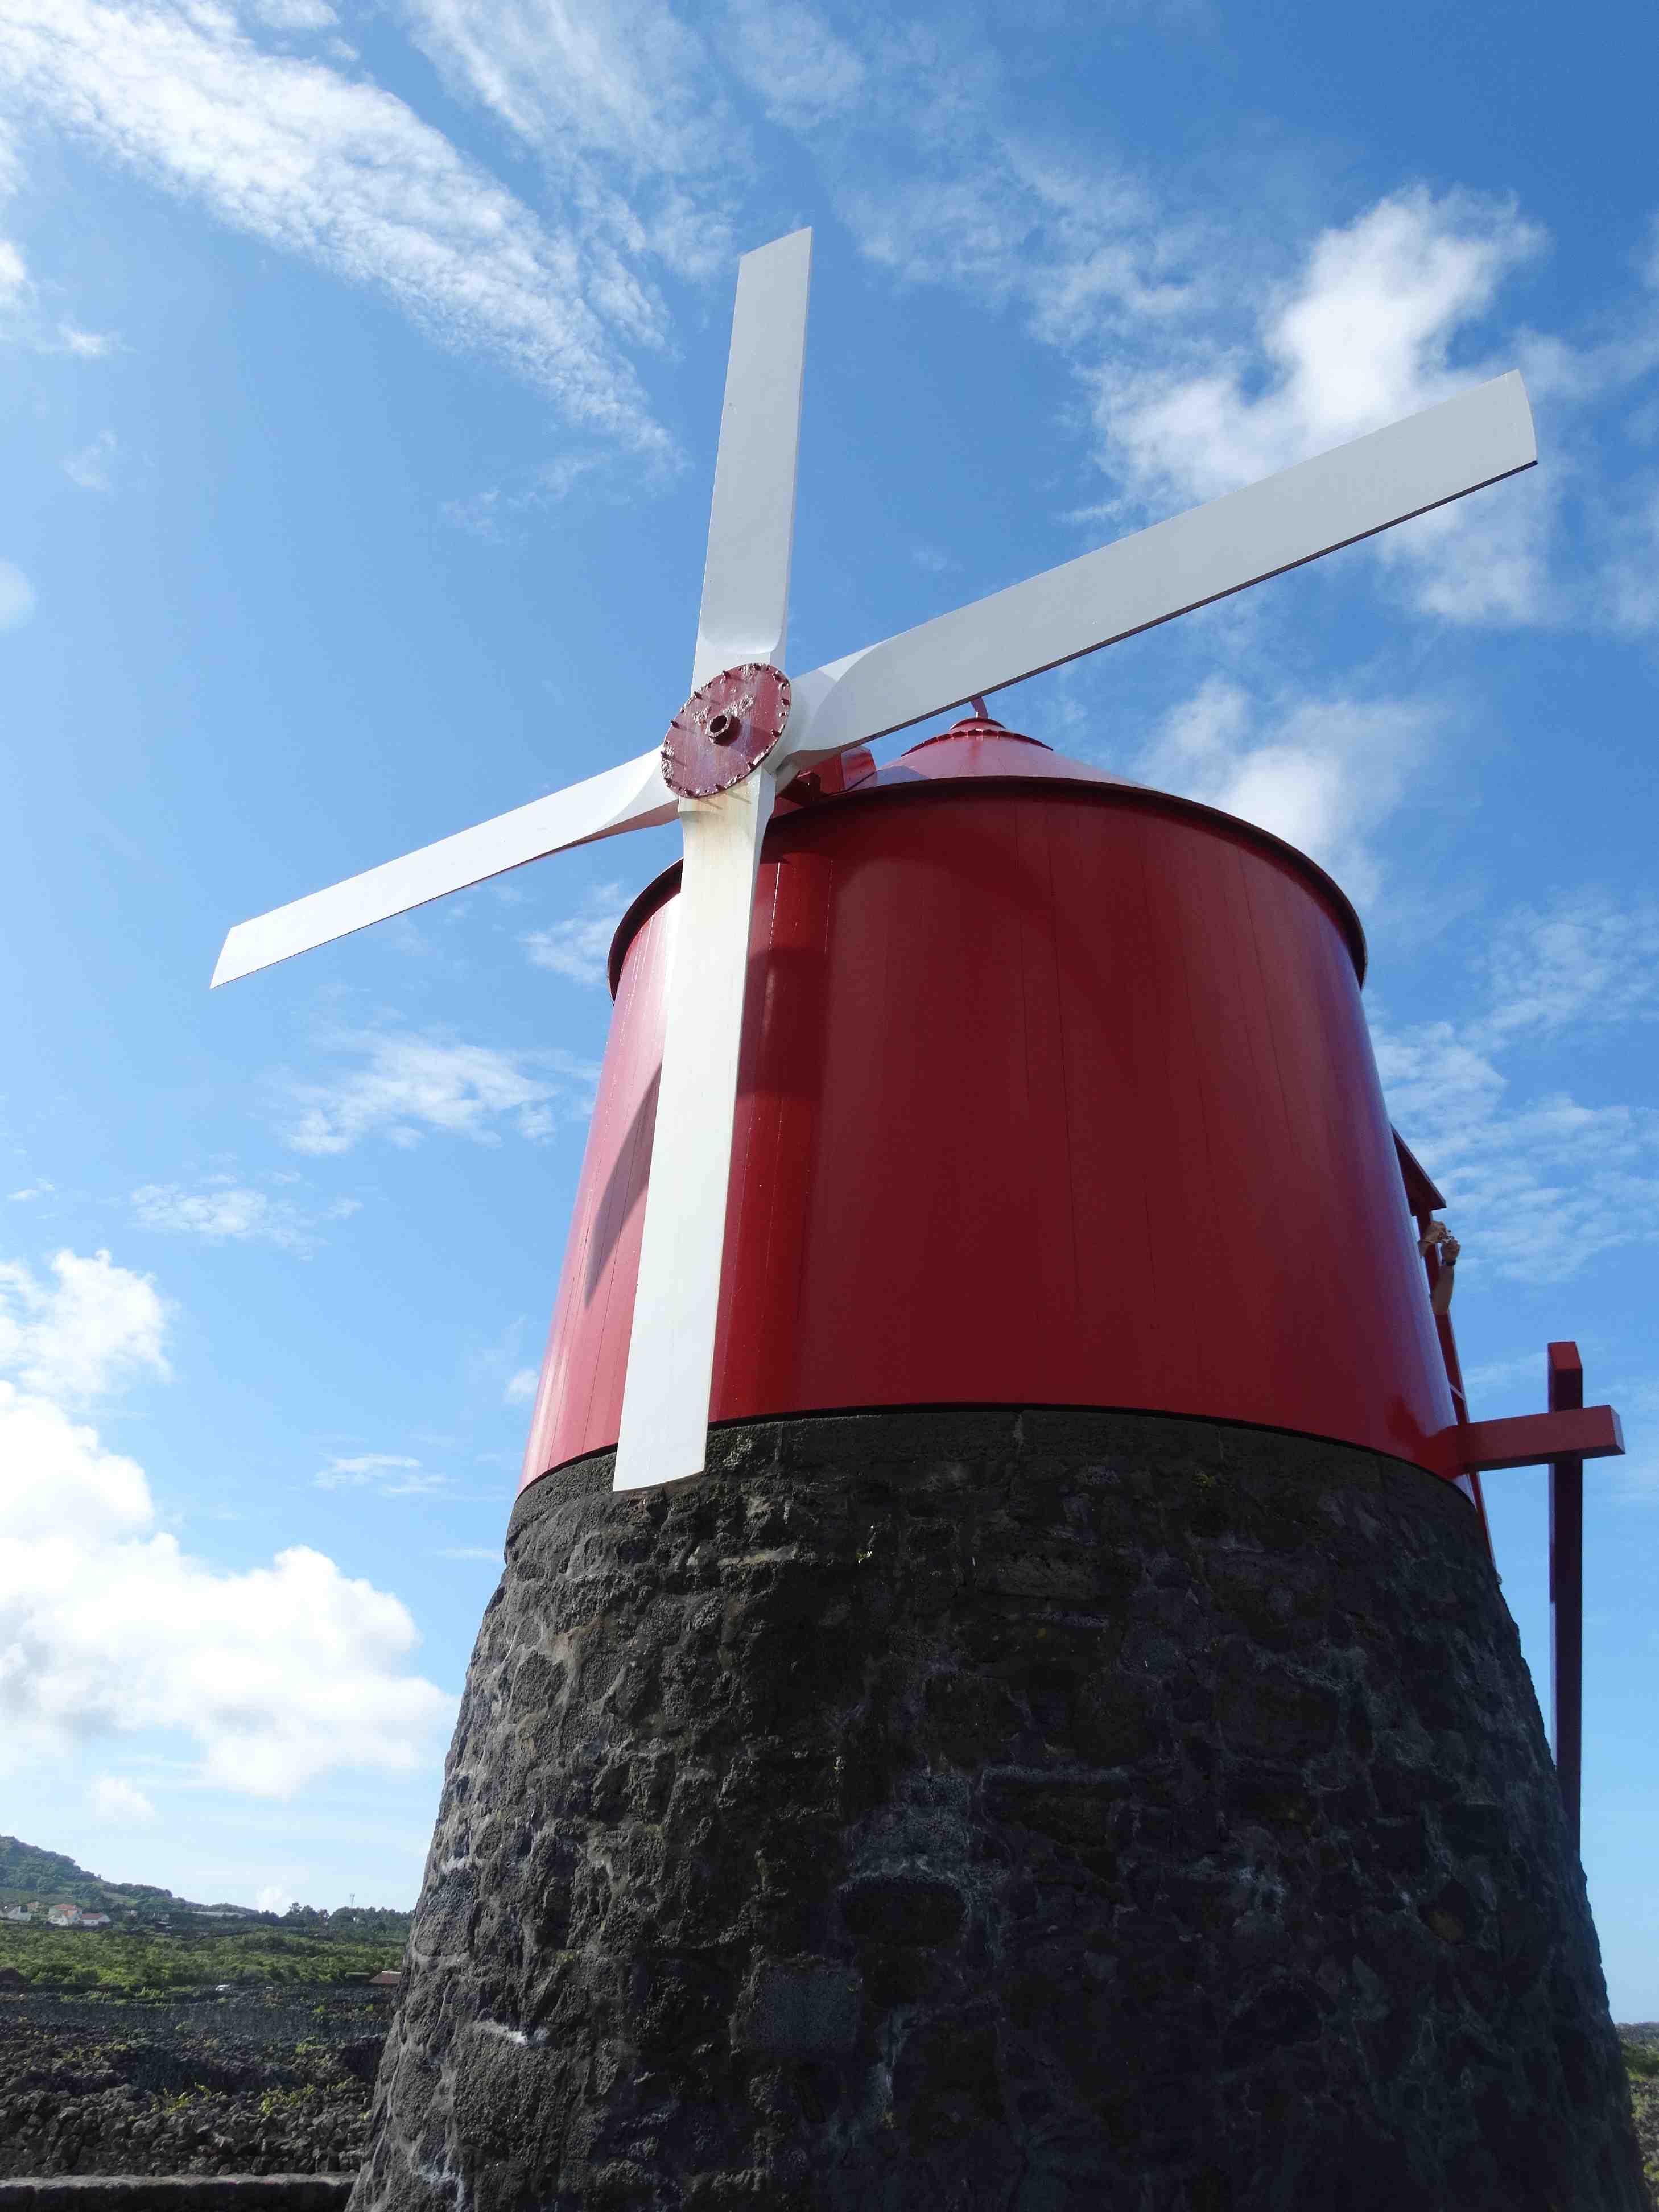 Windmolen op Pico